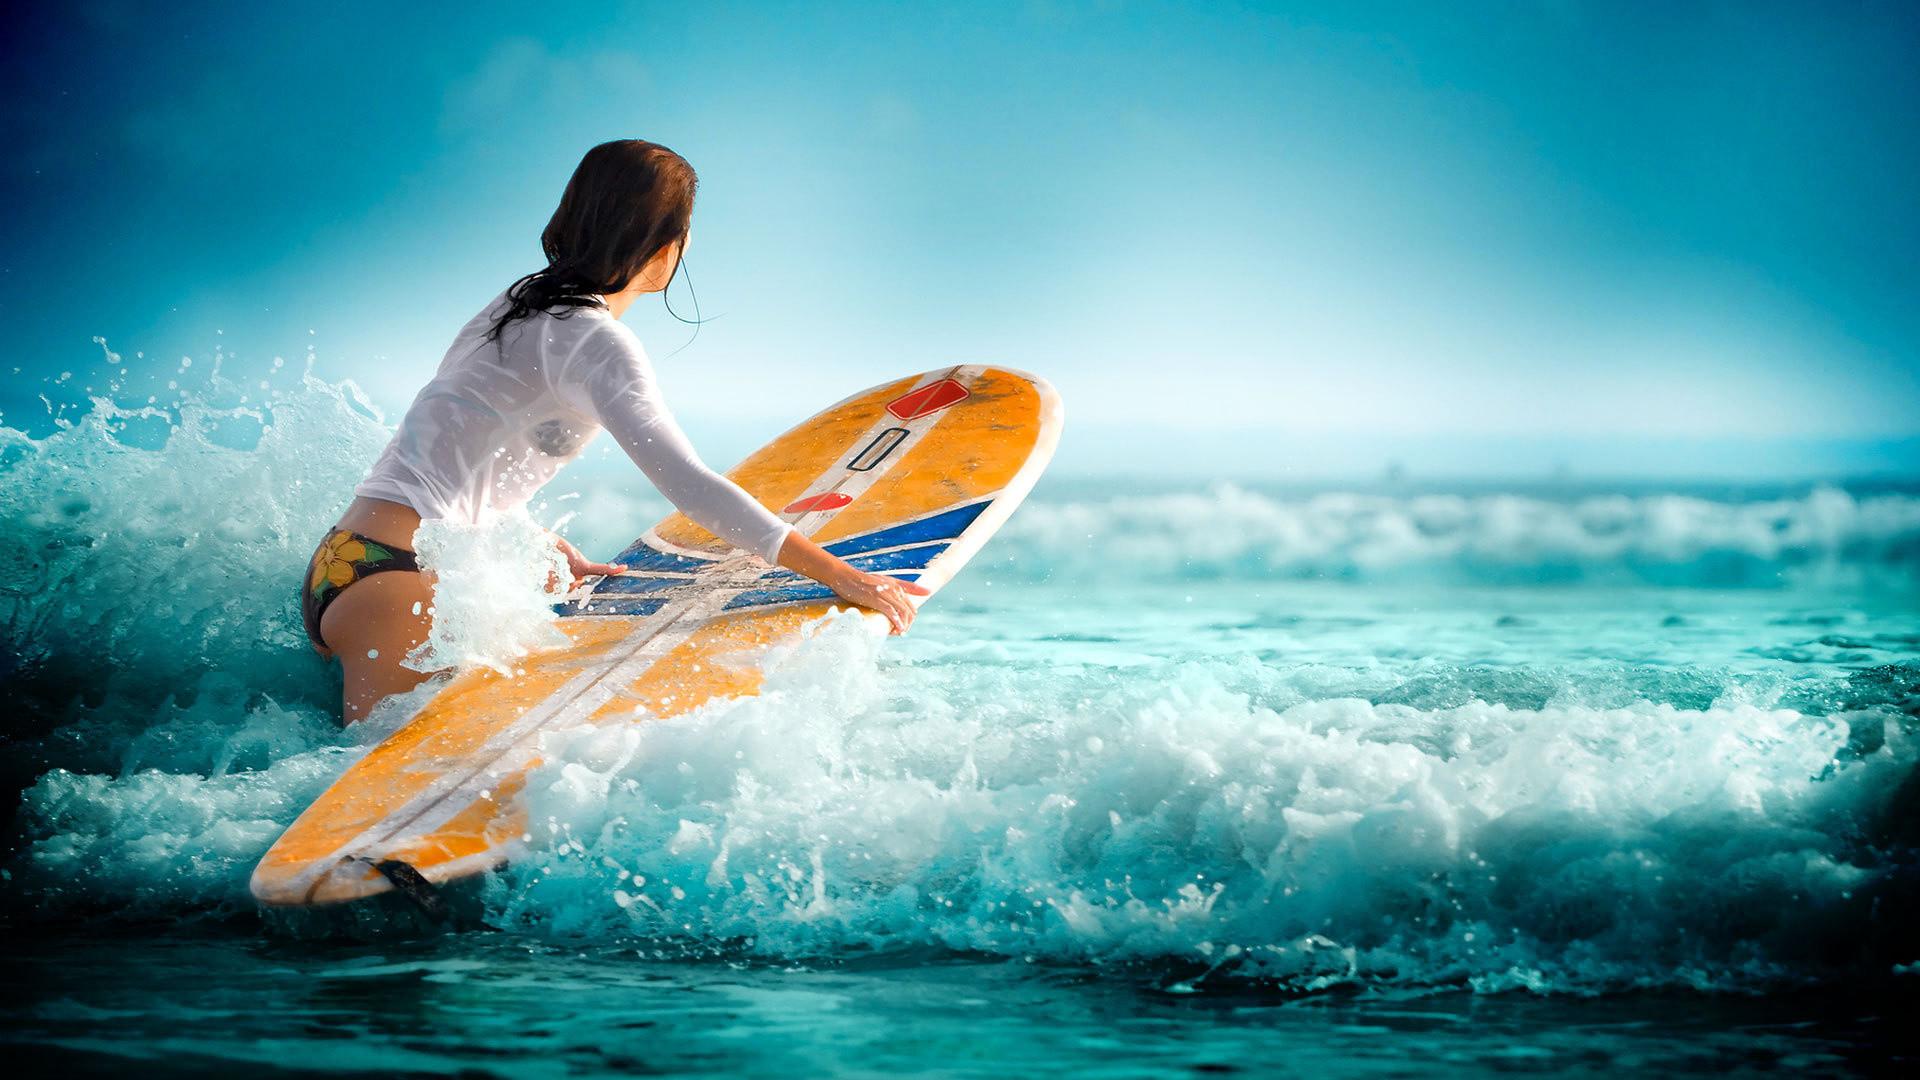 Surfing waves water sea girl wallpaper     117562 .